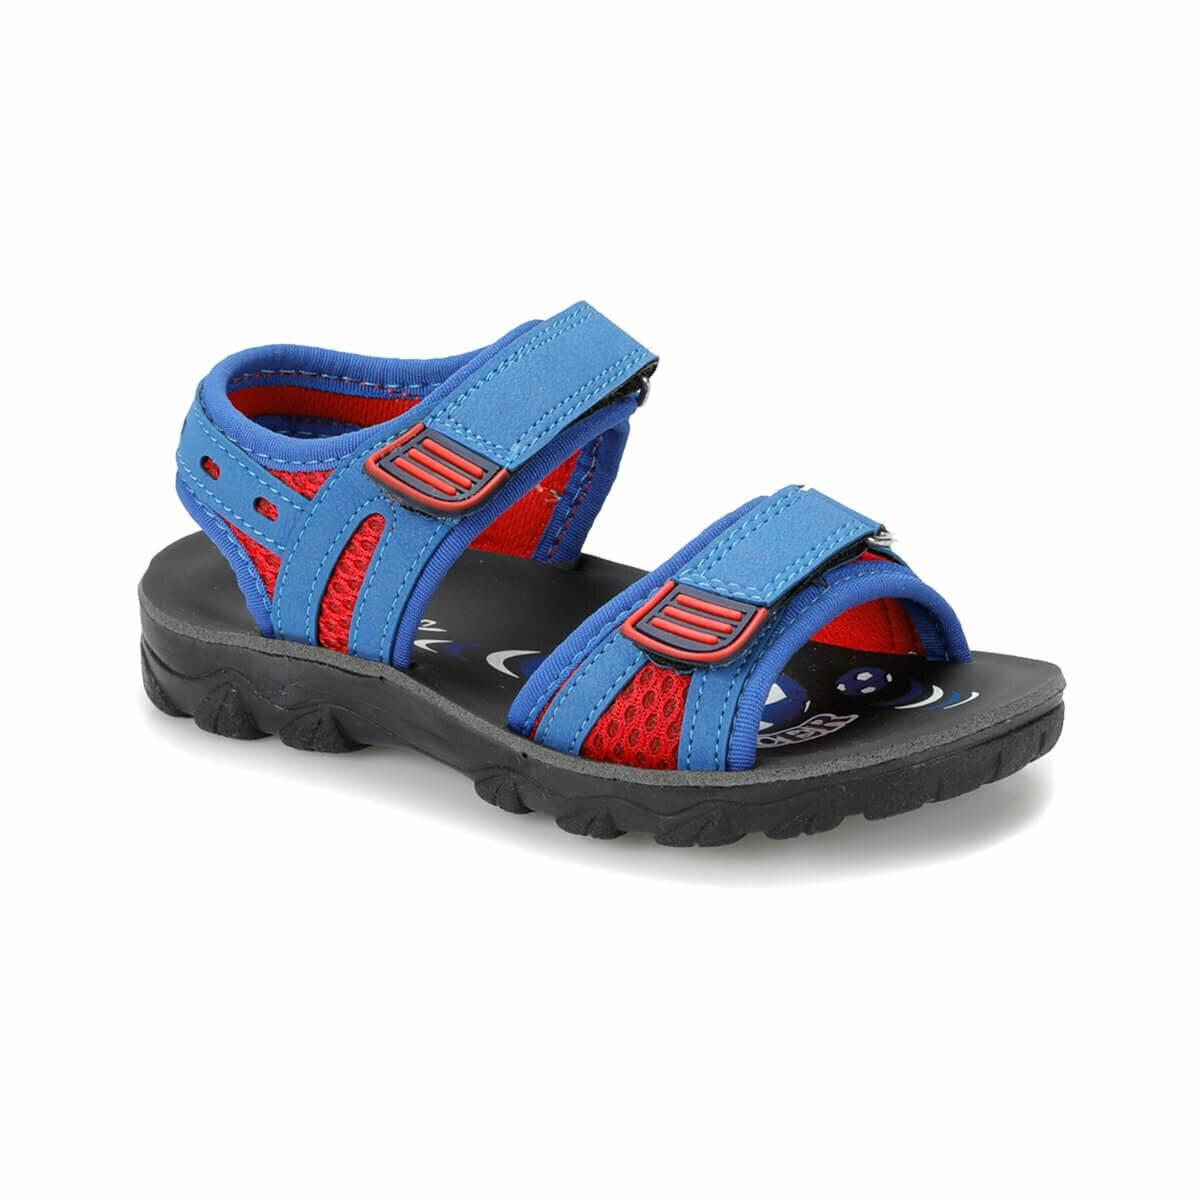 FLO 91. MAJOR-1.P Saks Male Child Sandals SPYMAN